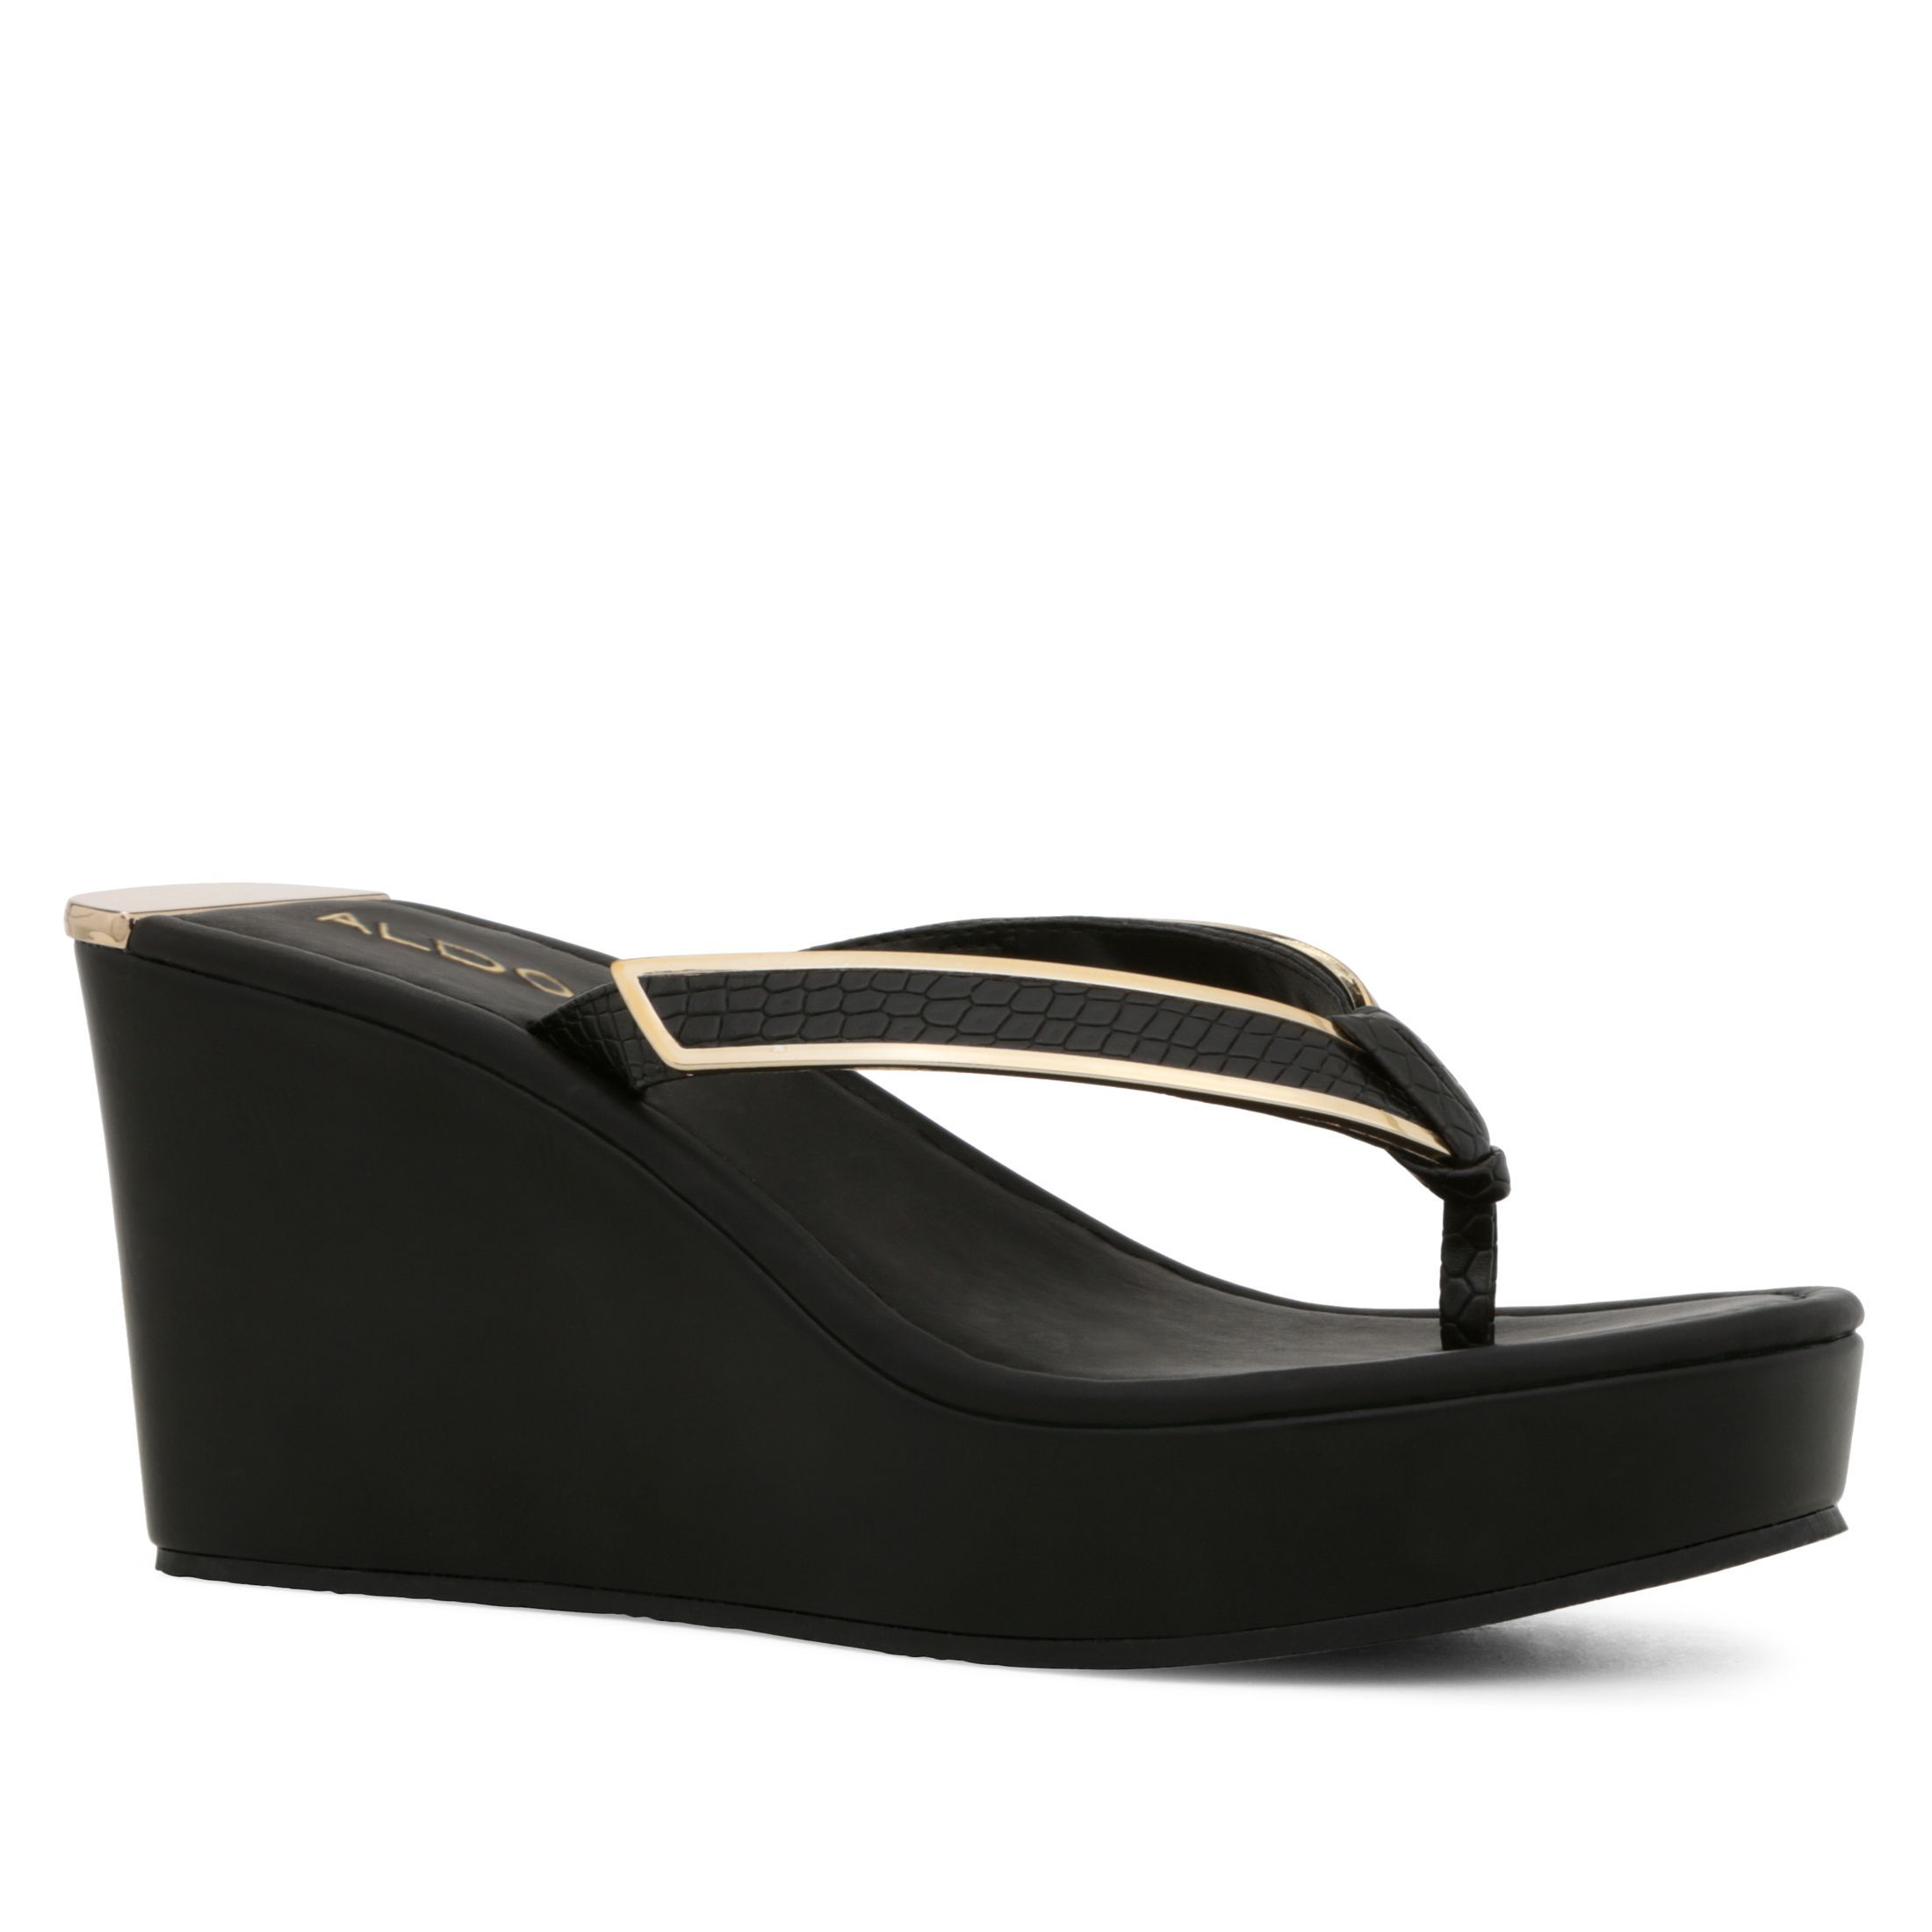 Womens sandals wedges - Aldo Jeroasien Wedge Sandal Black